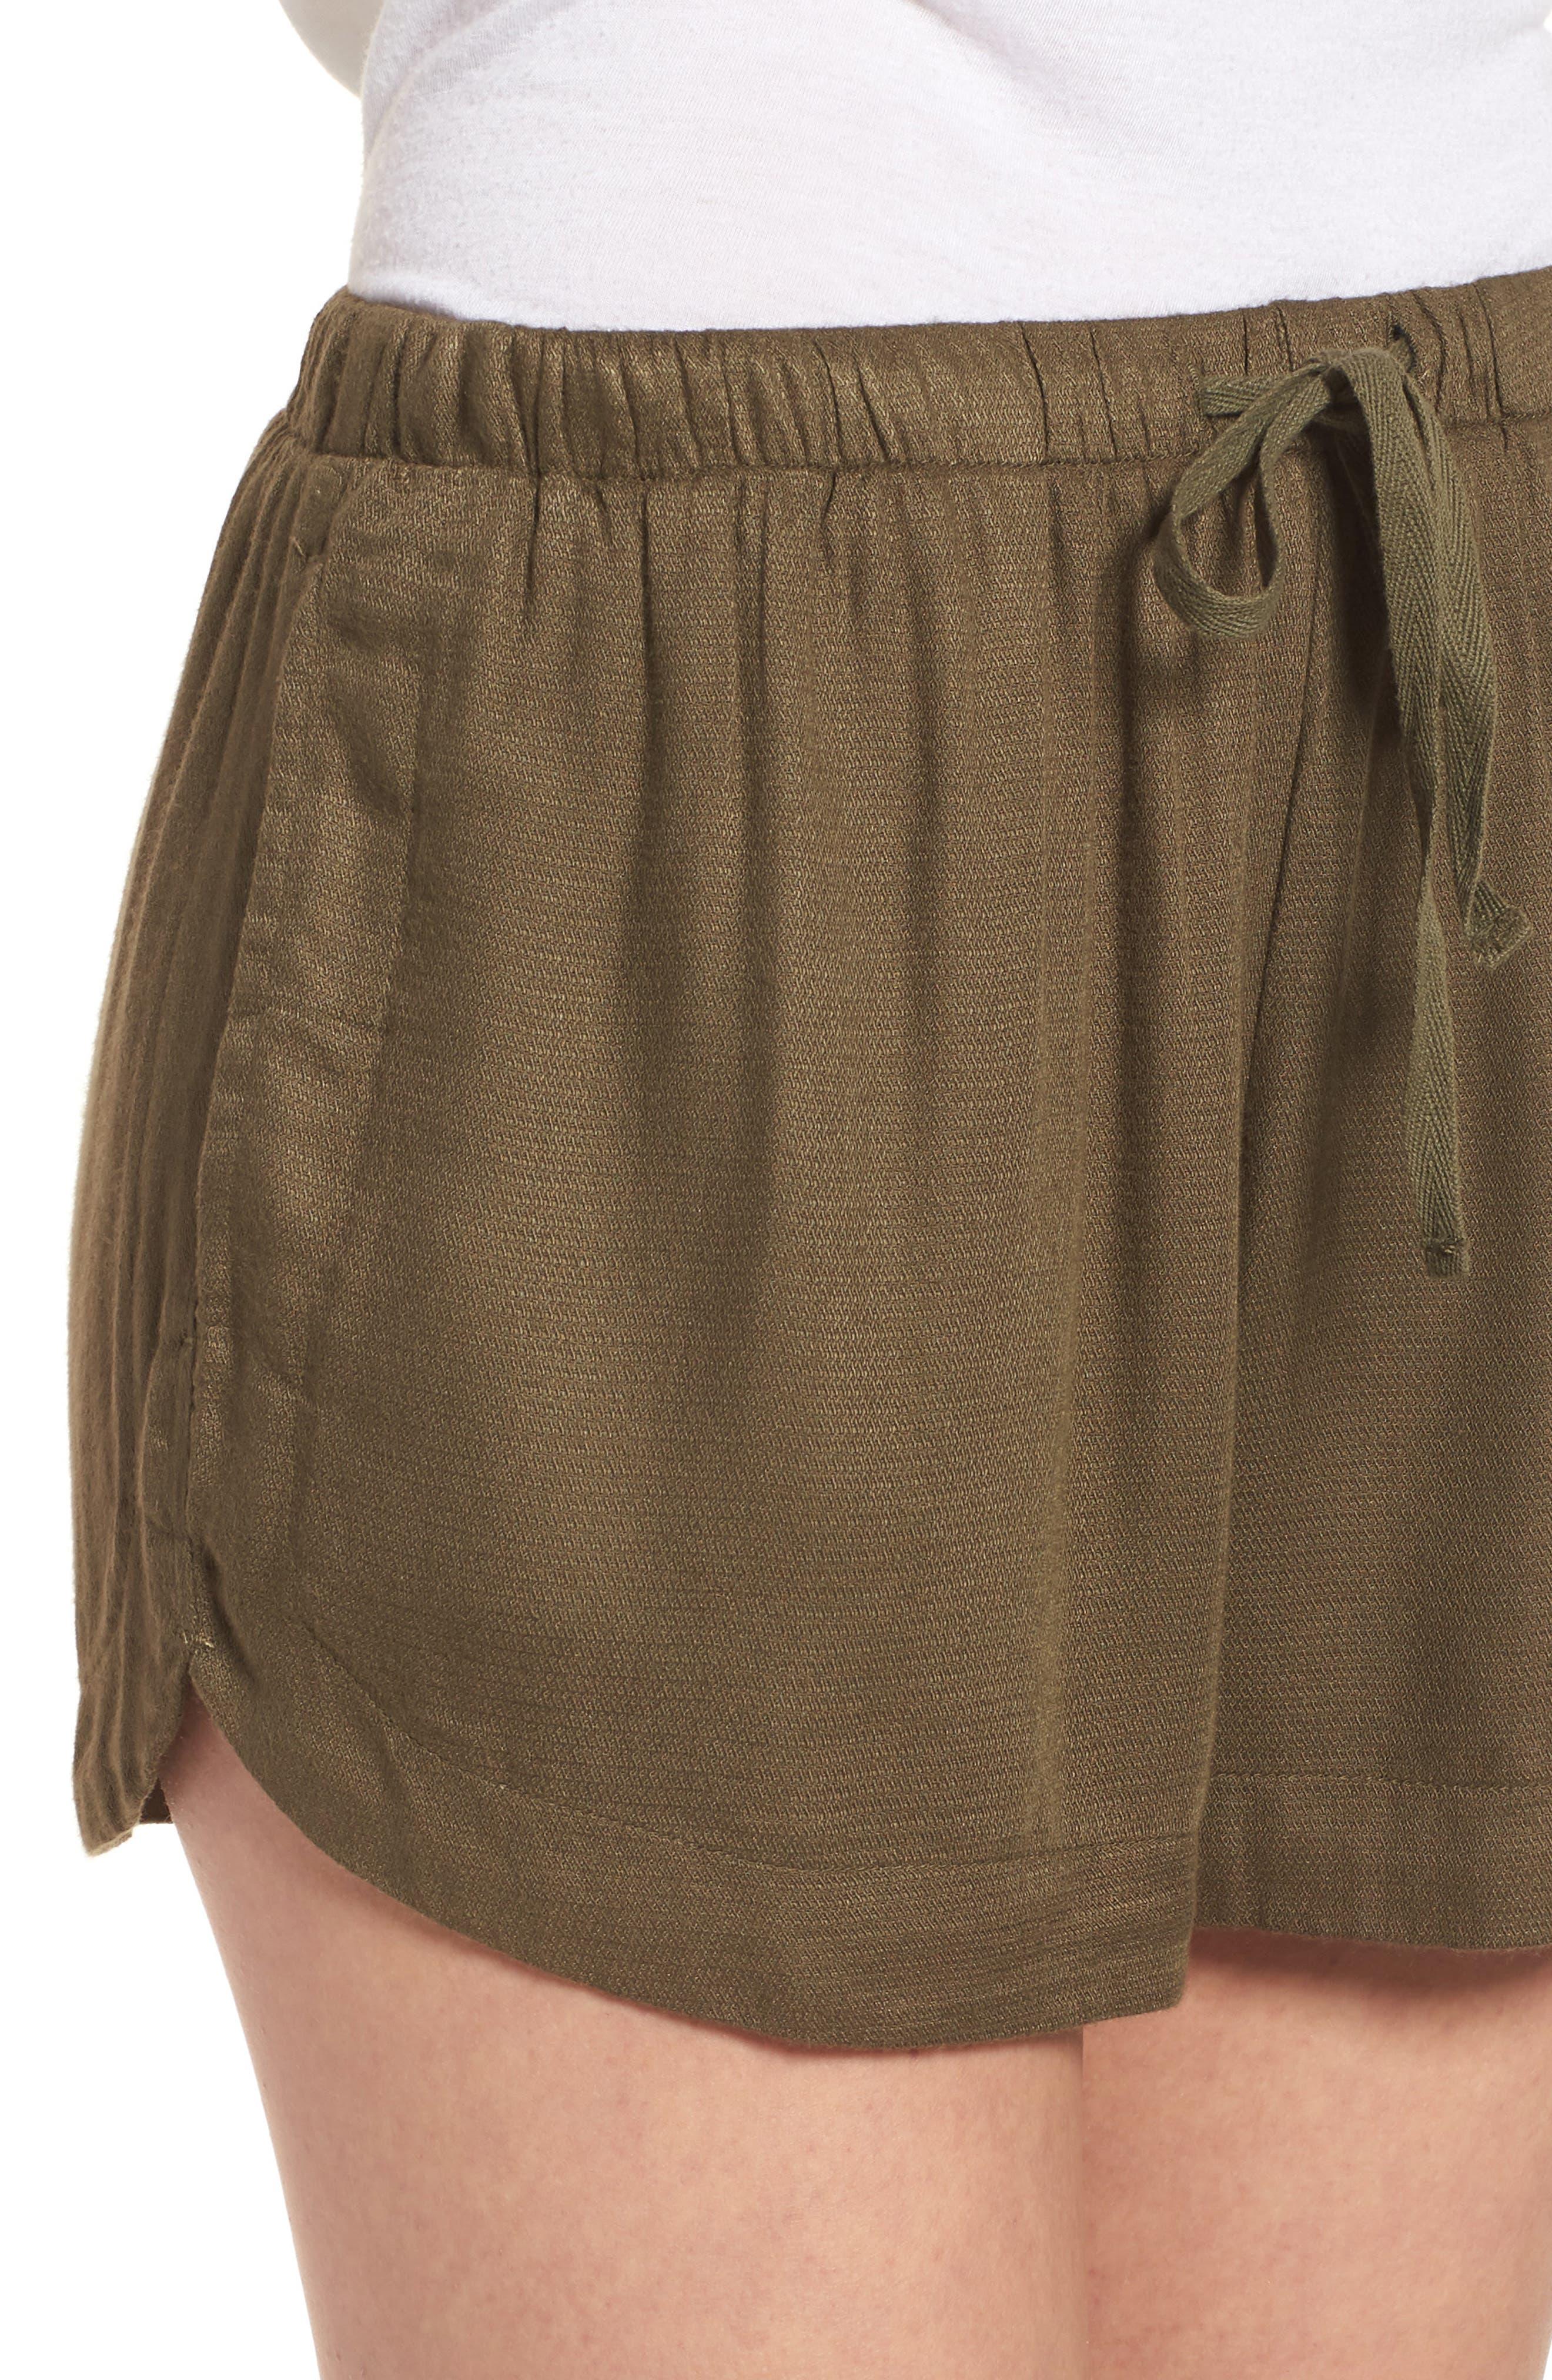 Vary Yume Shorts,                             Alternate thumbnail 4, color,                             Burnt Olive